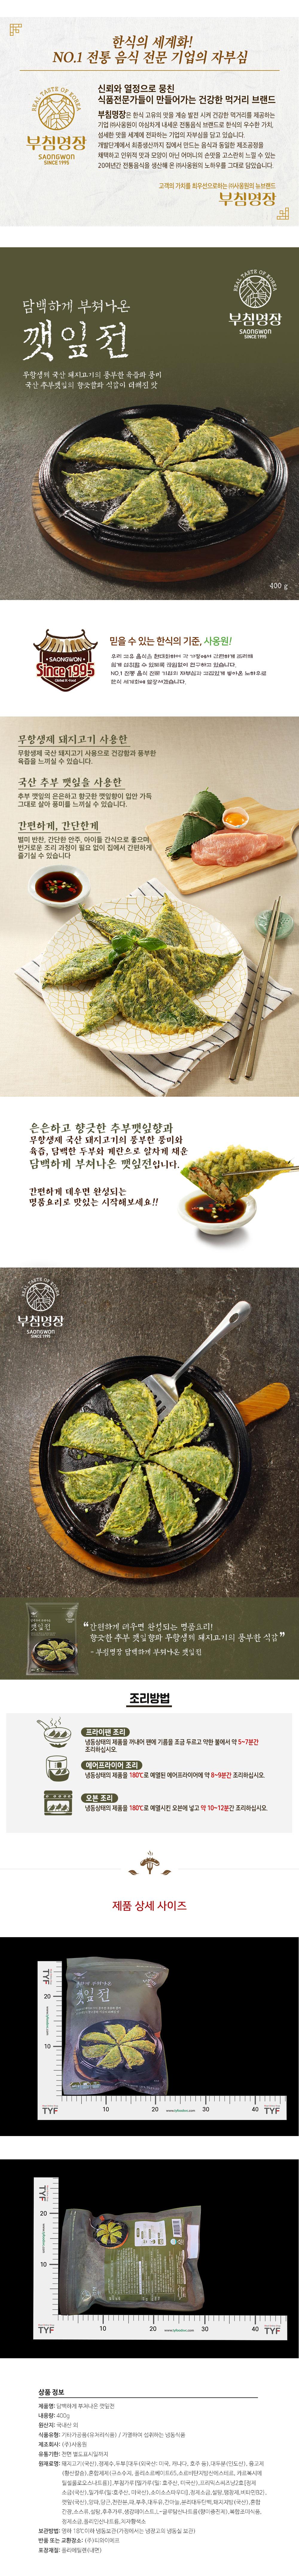 saongwon_kkaennipjeon.jpg